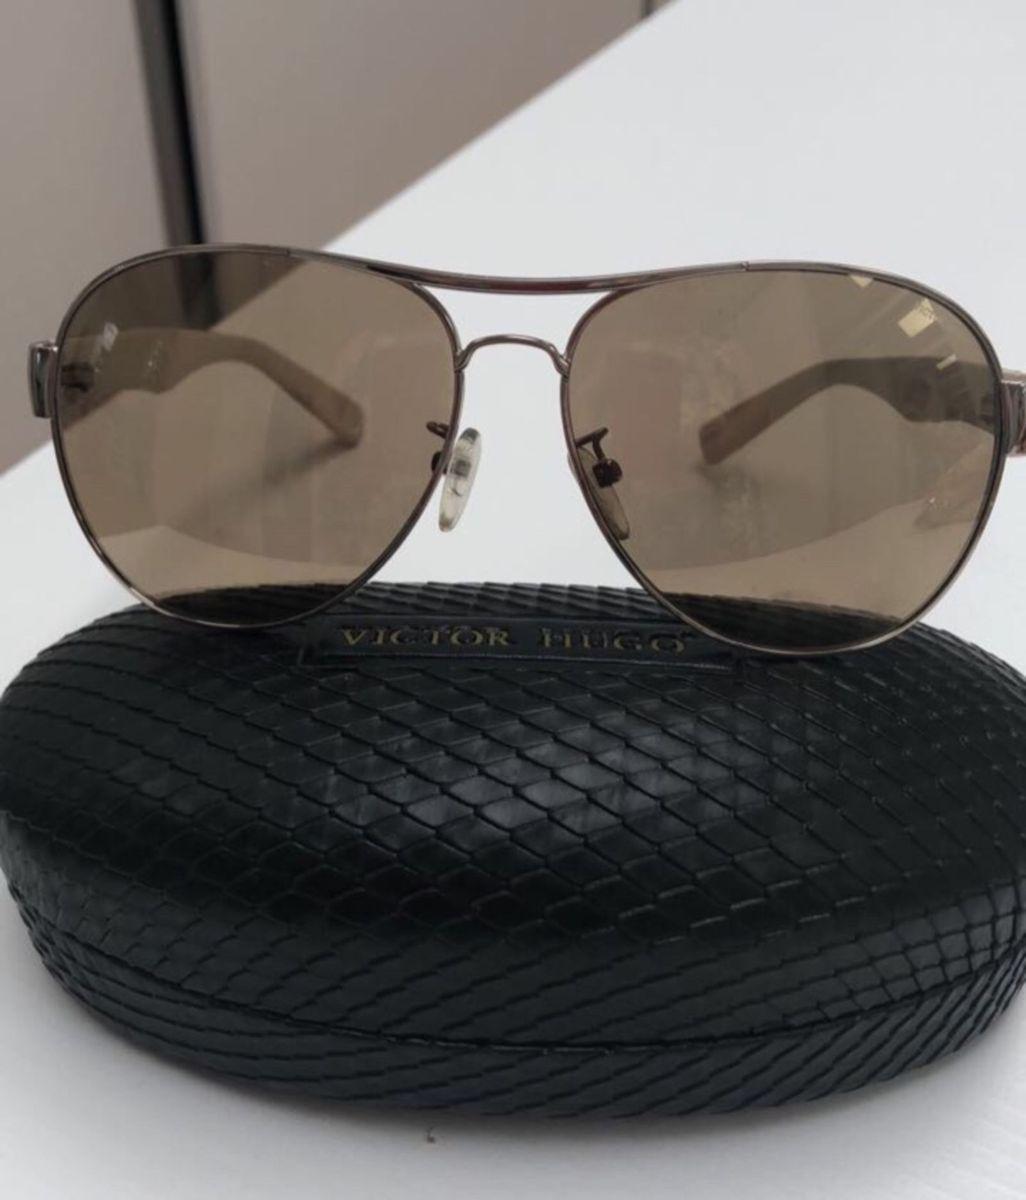 f517a9ee1d9 óculos de sol victor hugo - óculos victor hugo.  Czm6ly9wag90b3muzw5qb2vplmnvbs5ici9wcm9kdwn0cy81odmyodm2lzbkzgi1n2jintjiyte3ndzlmti0njrkotkyzwq1yti1lmpwzw